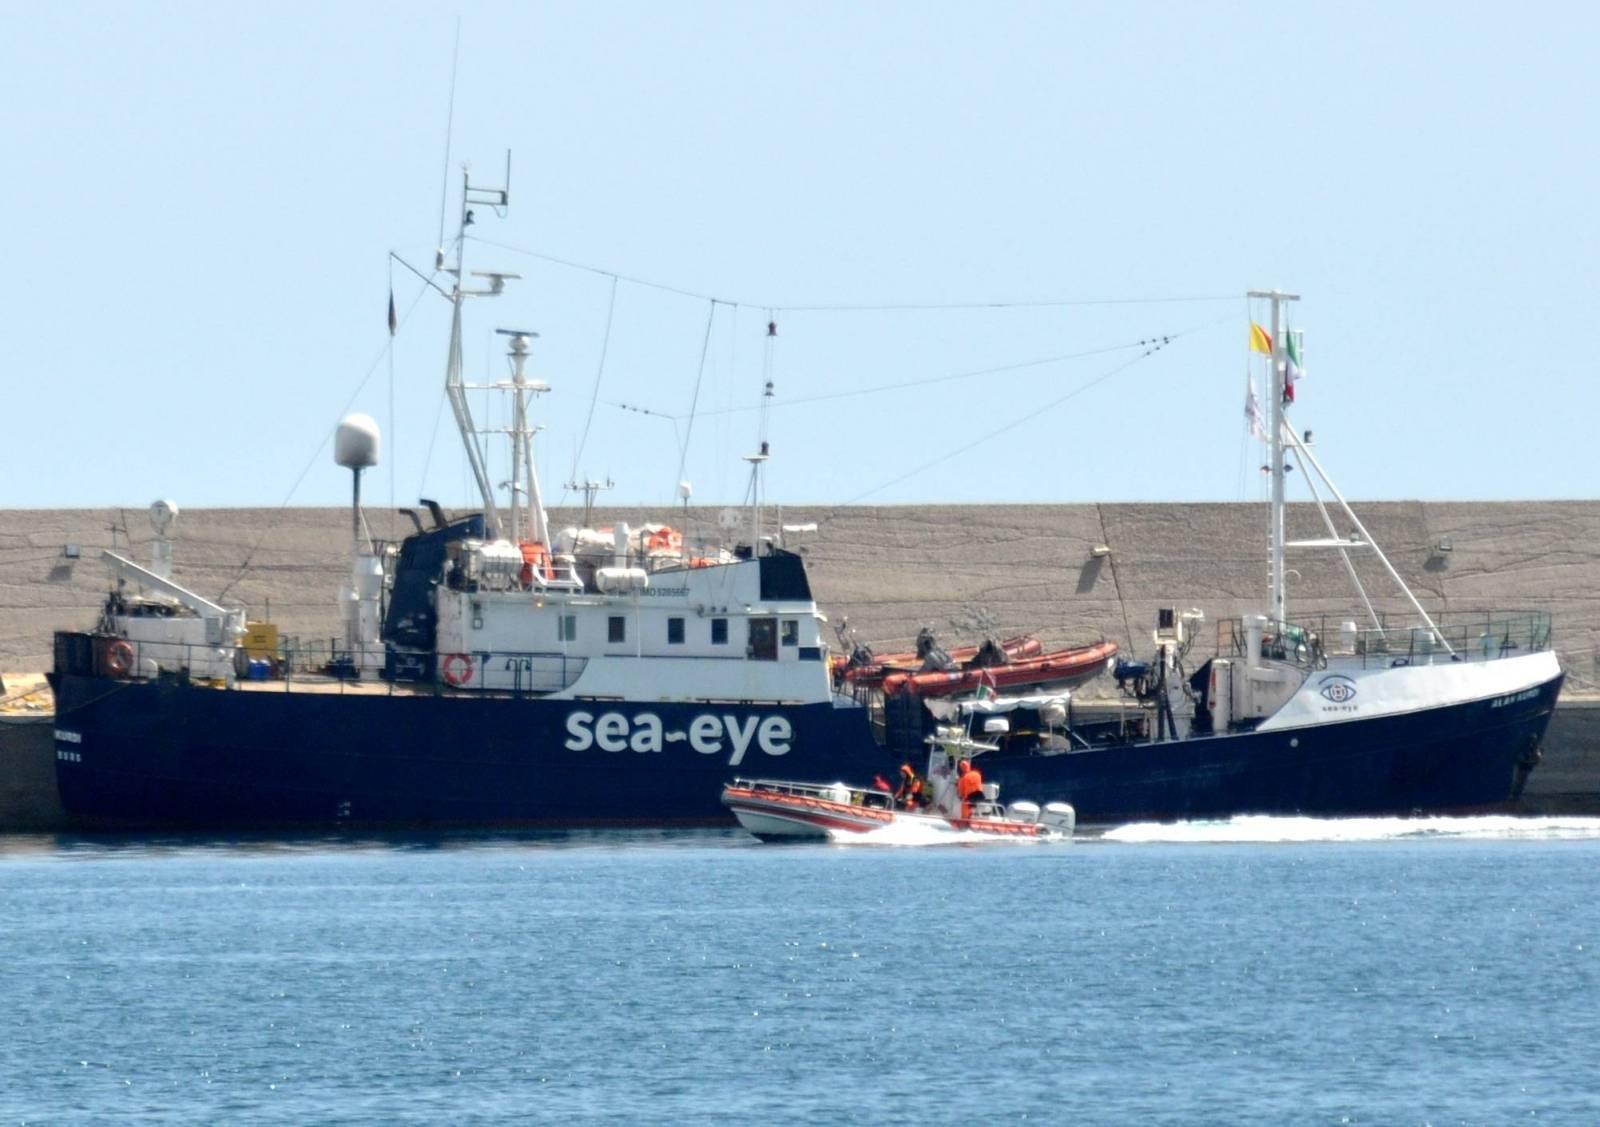 Alan Kurdi ship docked at the port subject to administrative detention